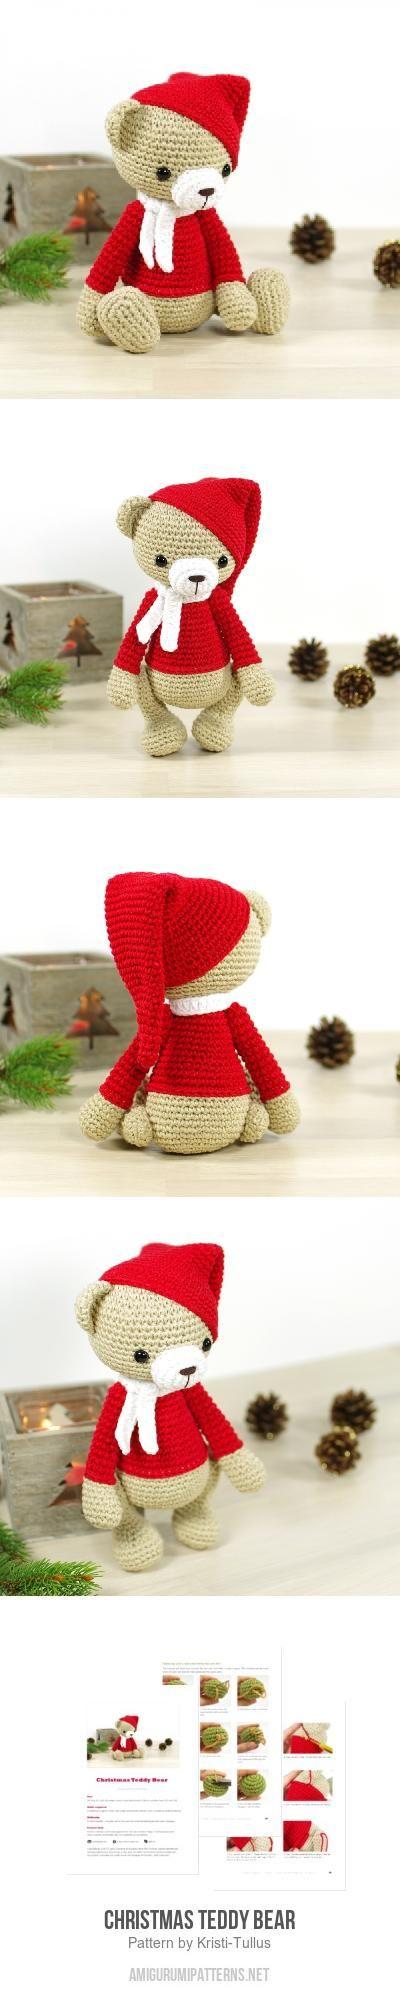 Christmas Teddy Bear Amigurumi Pattern for purchase